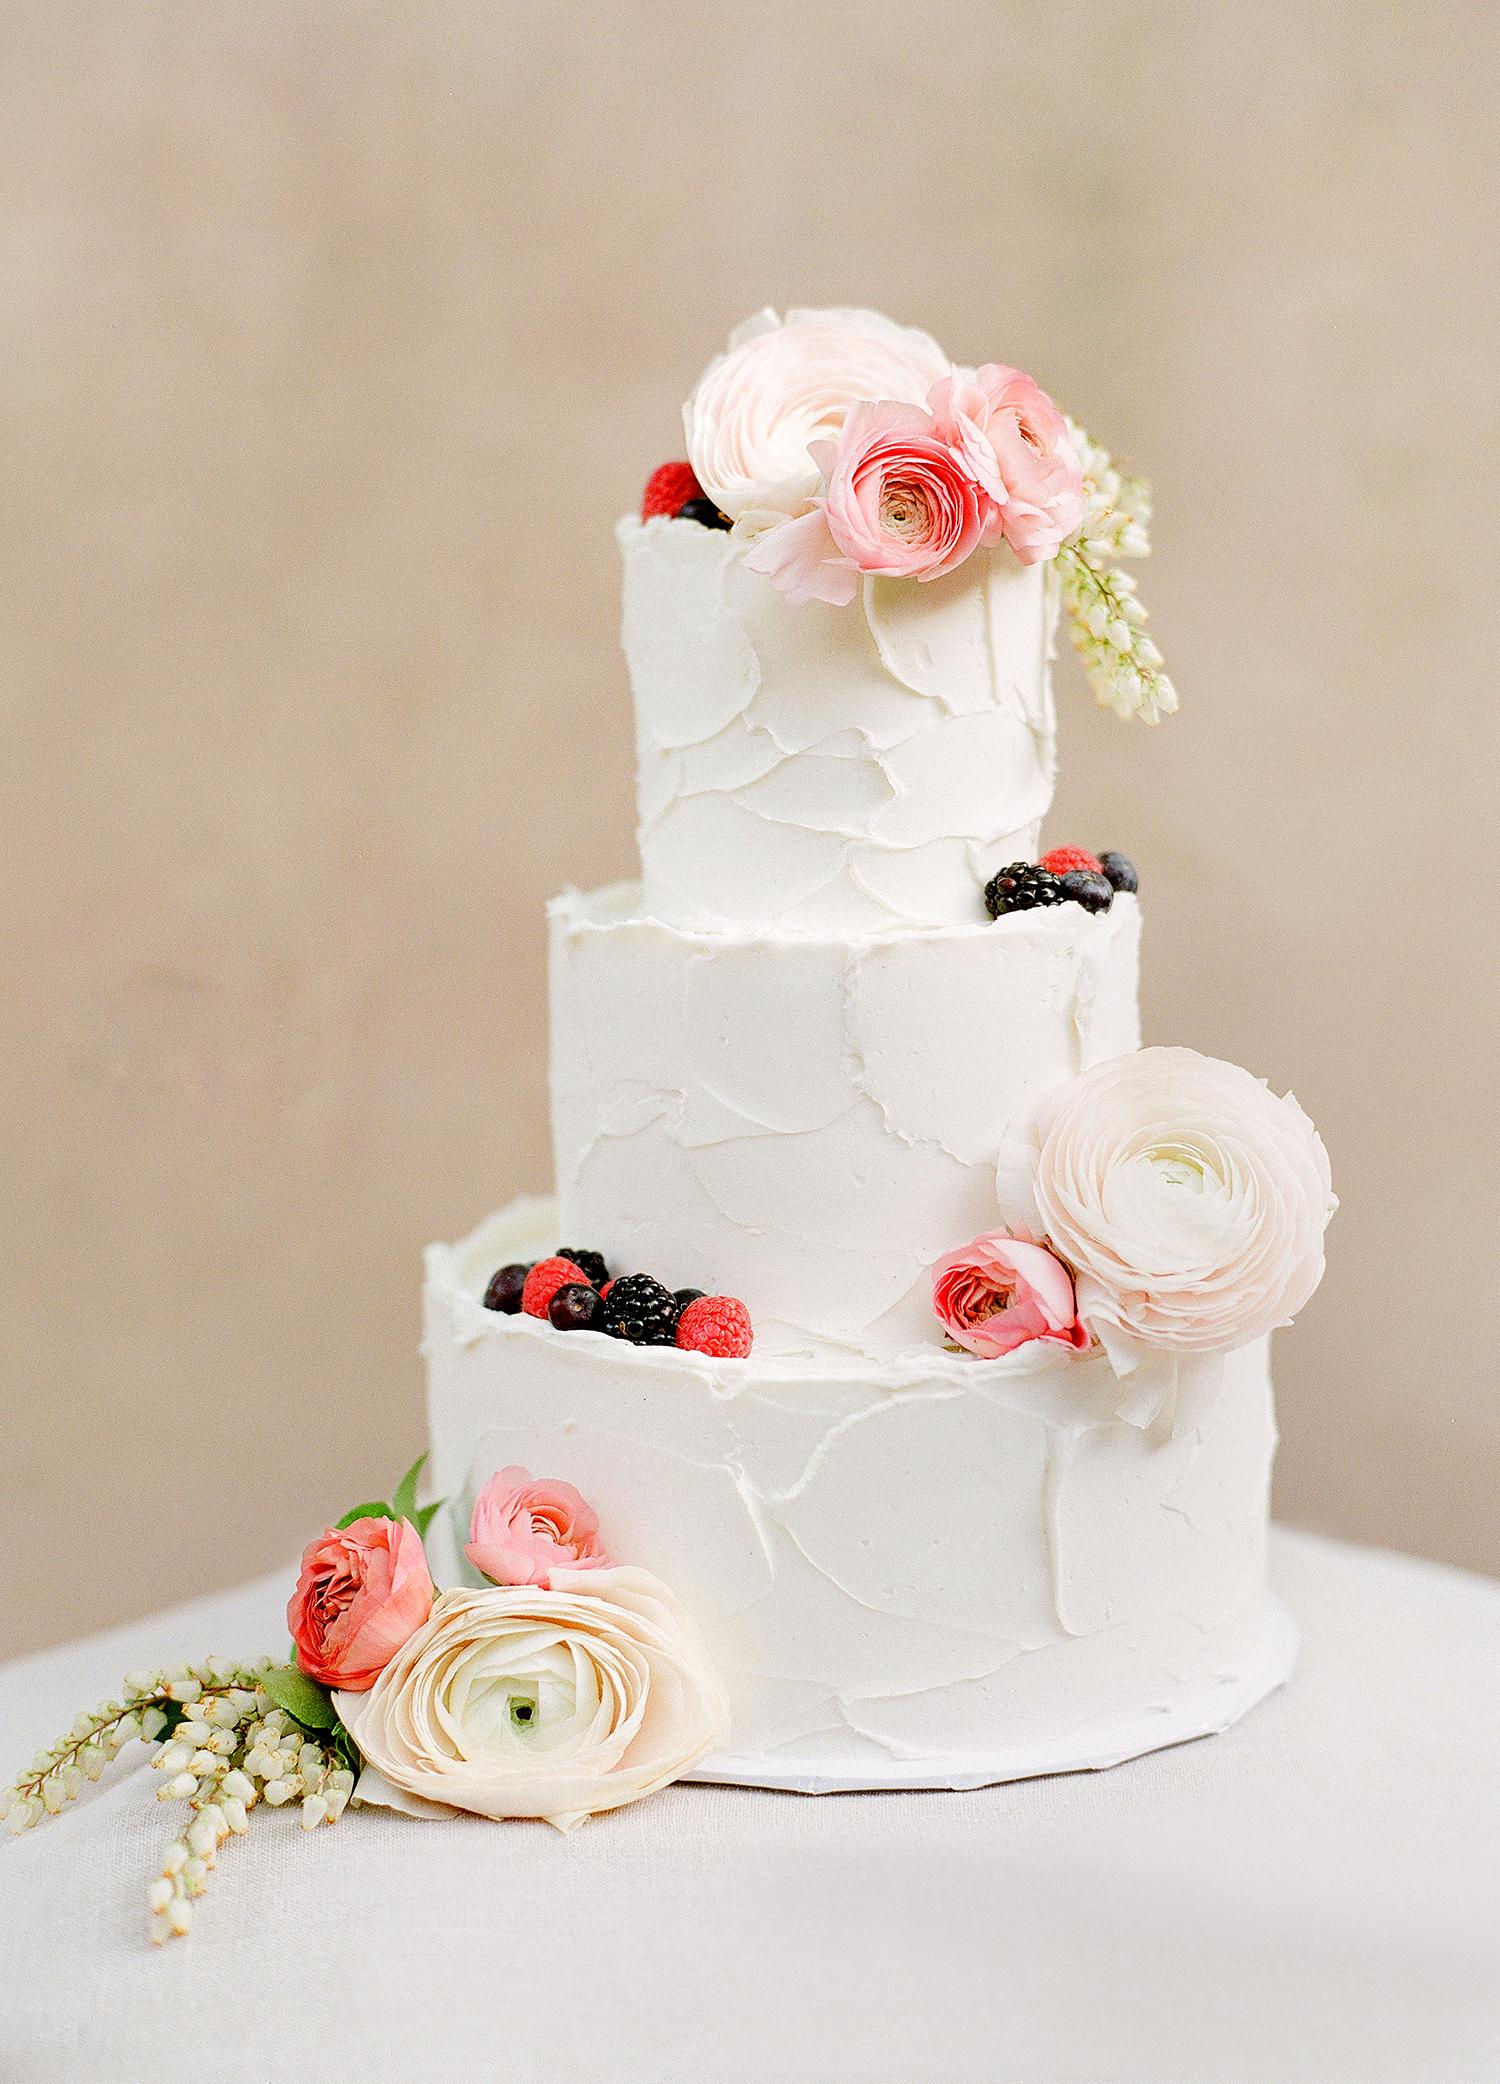 marianne patrick wedding cake